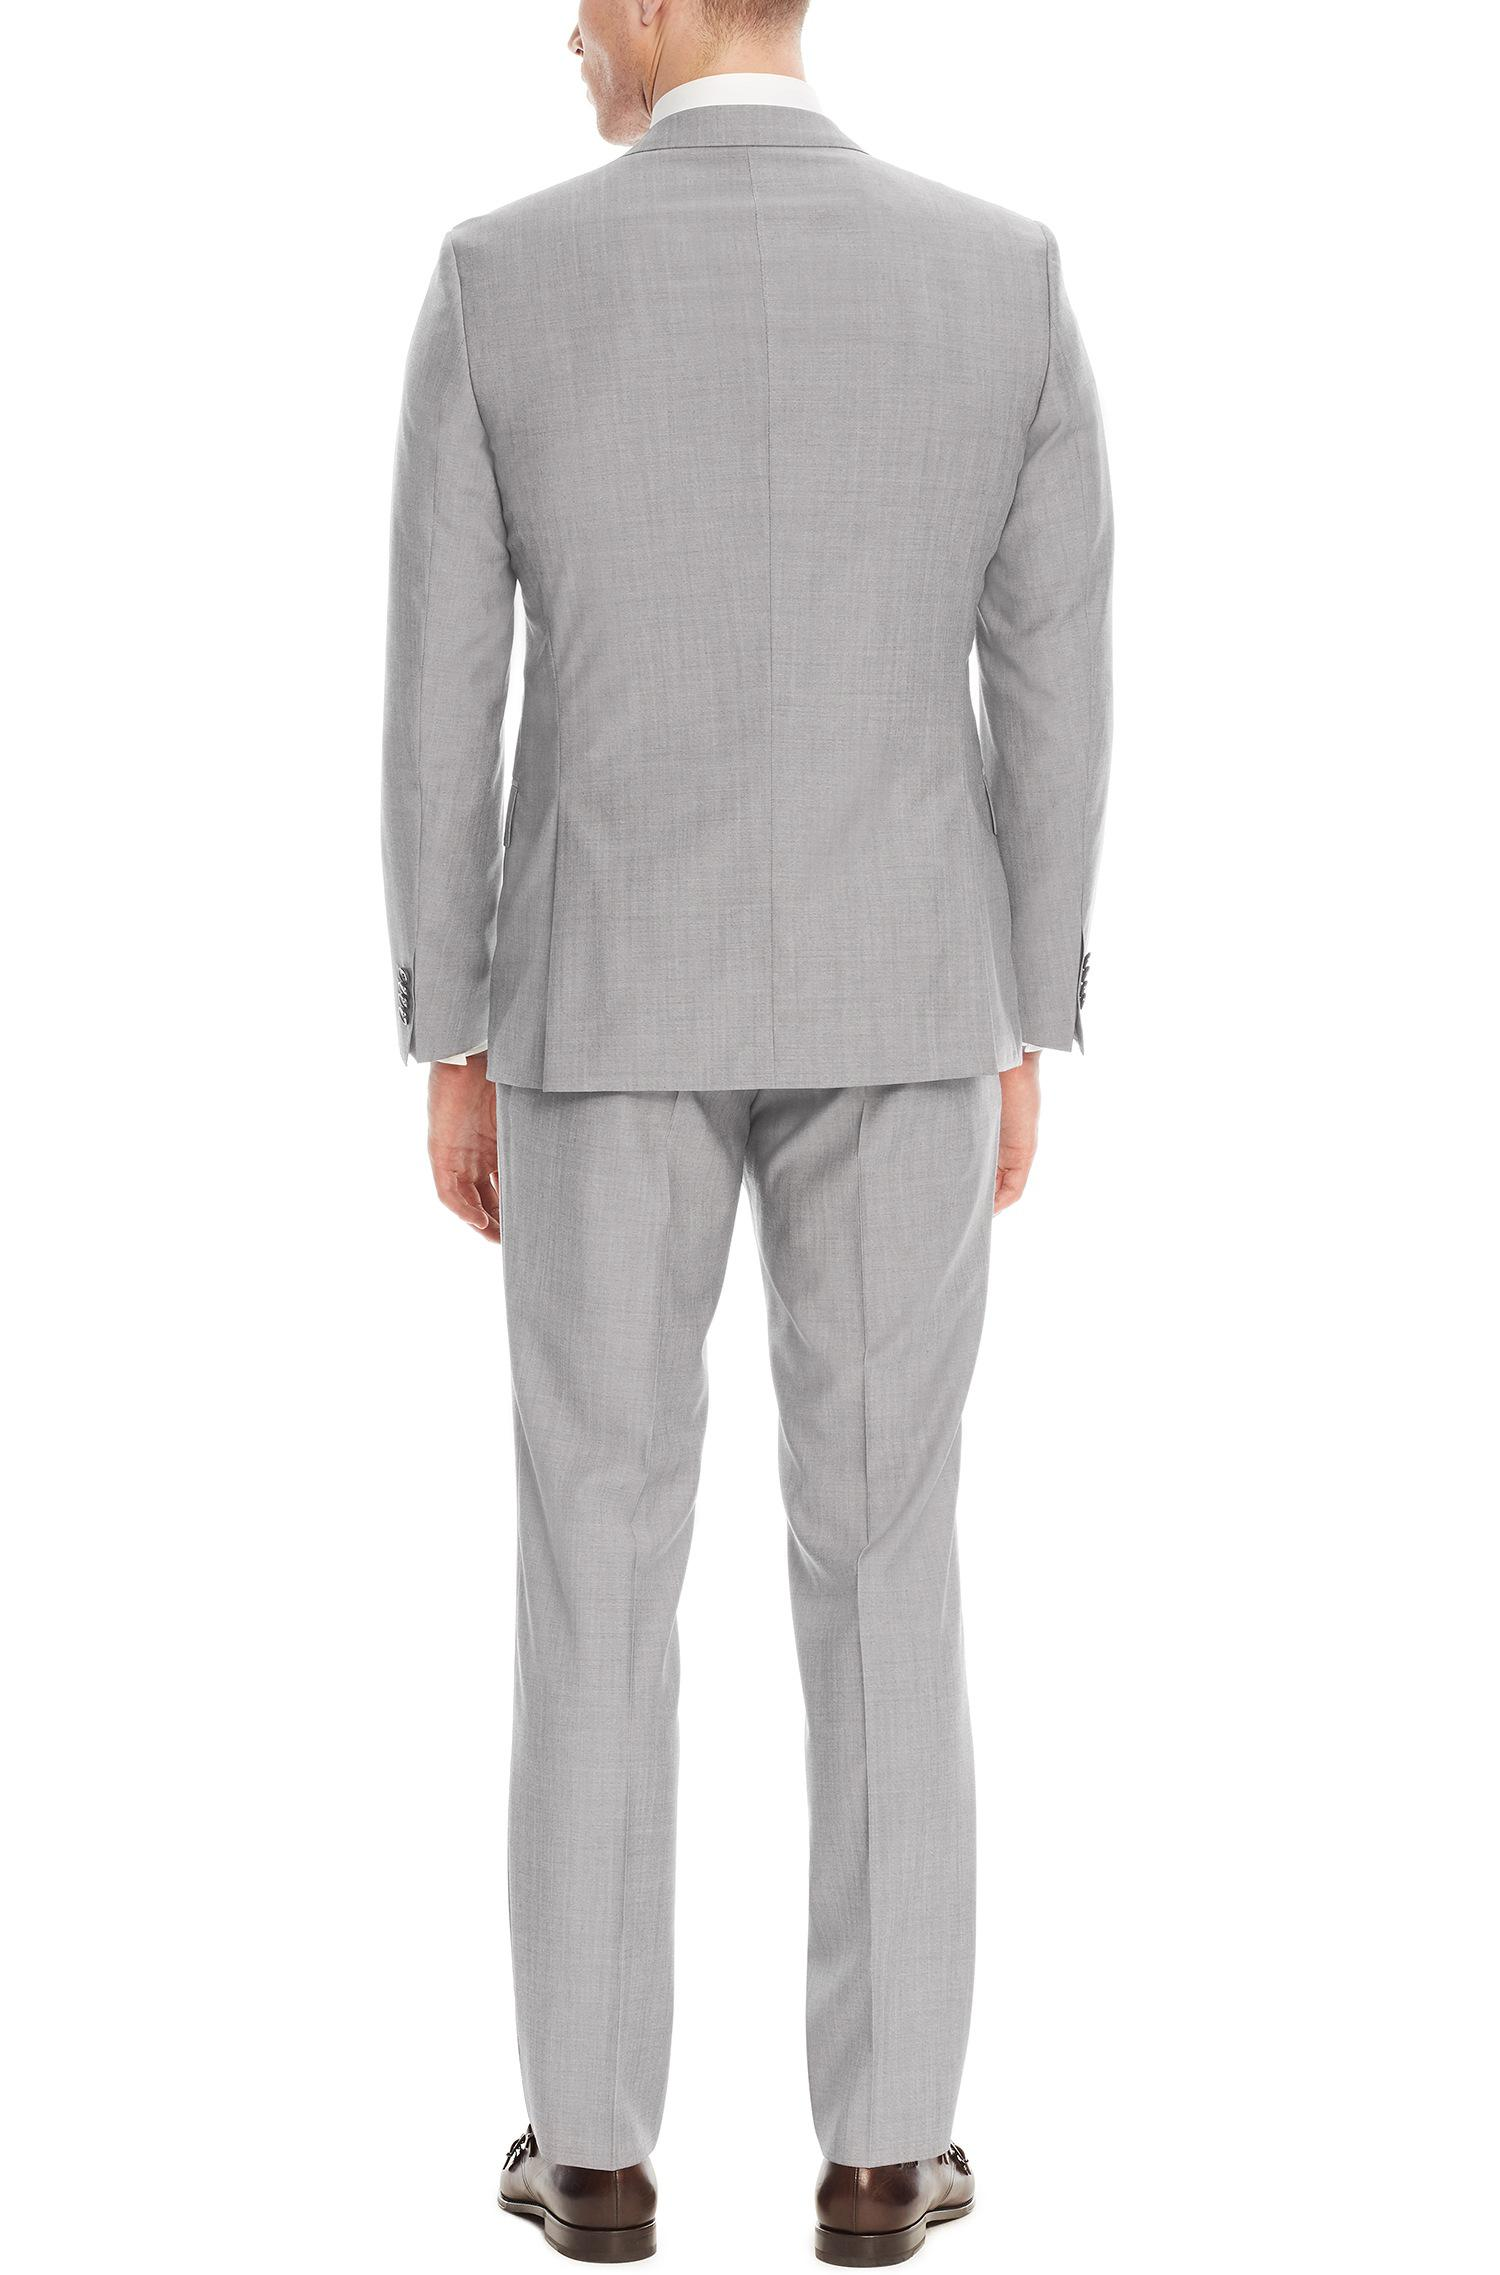 d197a5b33 BOSS - Gray Italian Super 110 Virgin Wool Suit, Slim Fit | Huge/genius.  View fullscreen